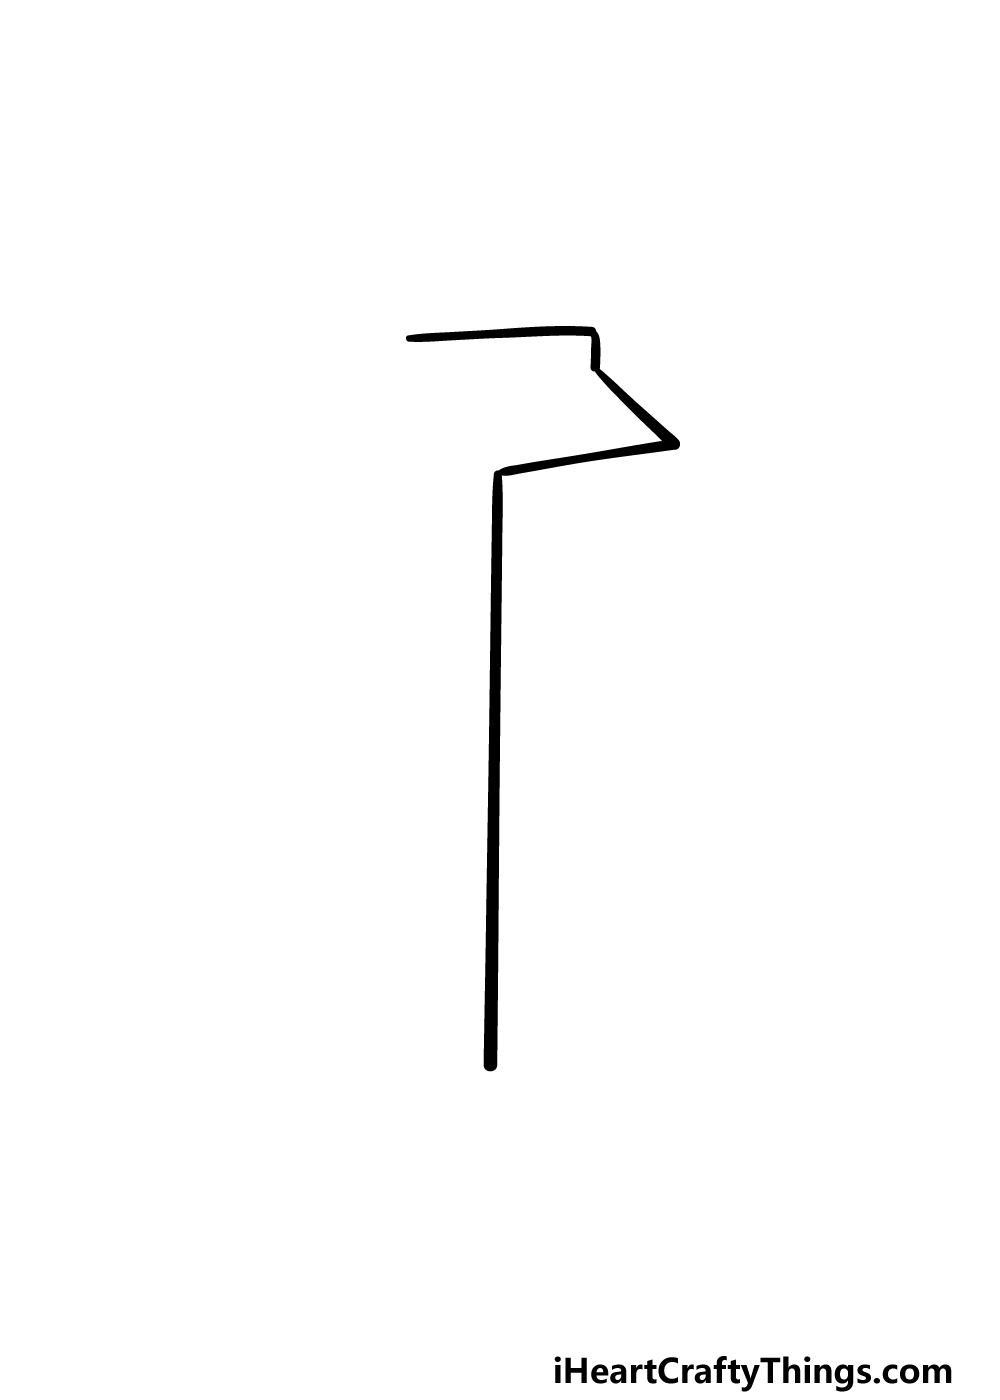 drawing a milk carton step 1